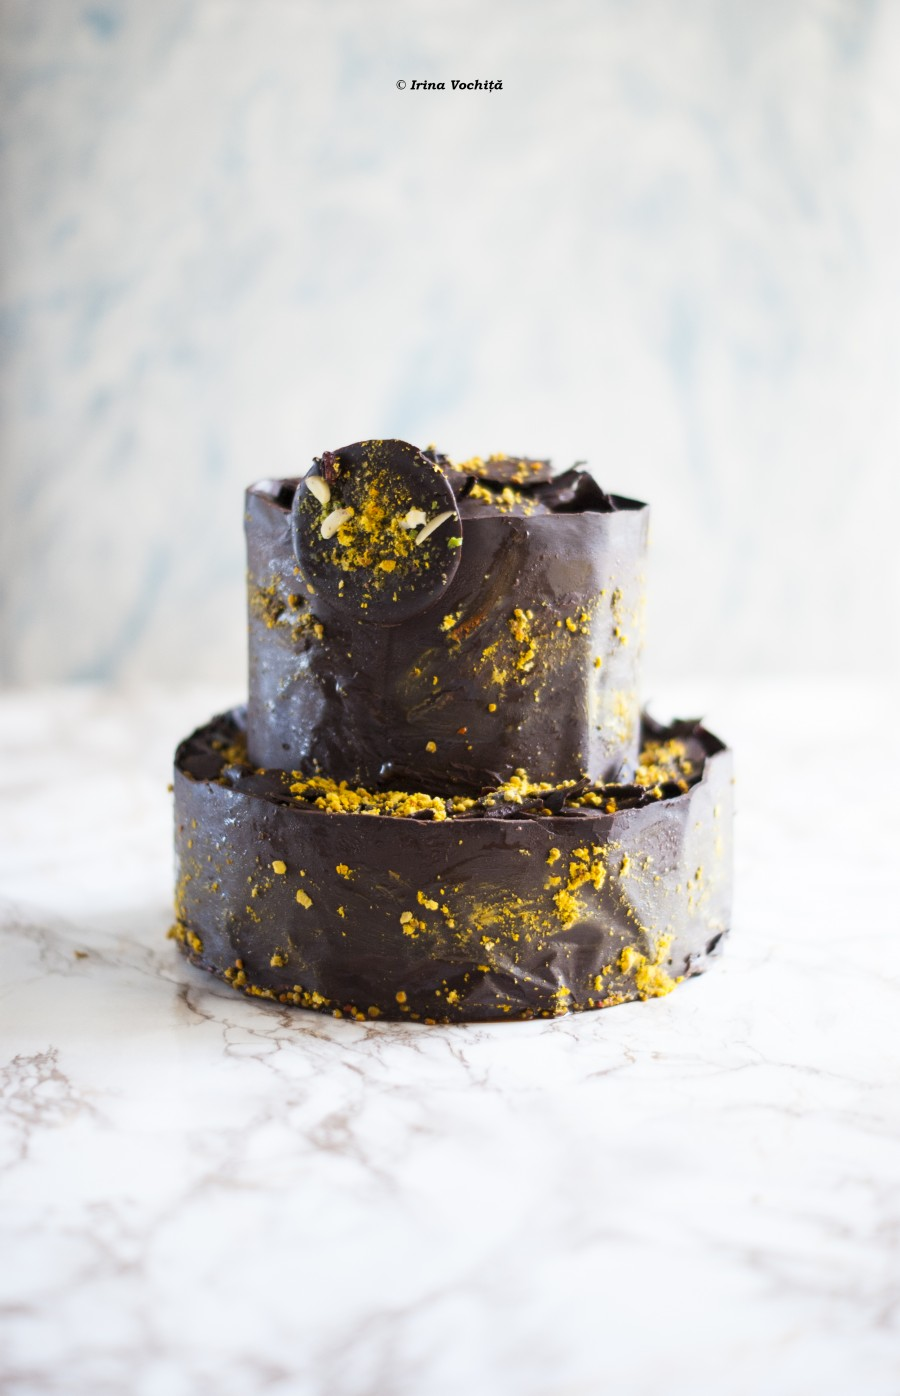 tort-etajat-de-ciocolata-sportychoco.jpg